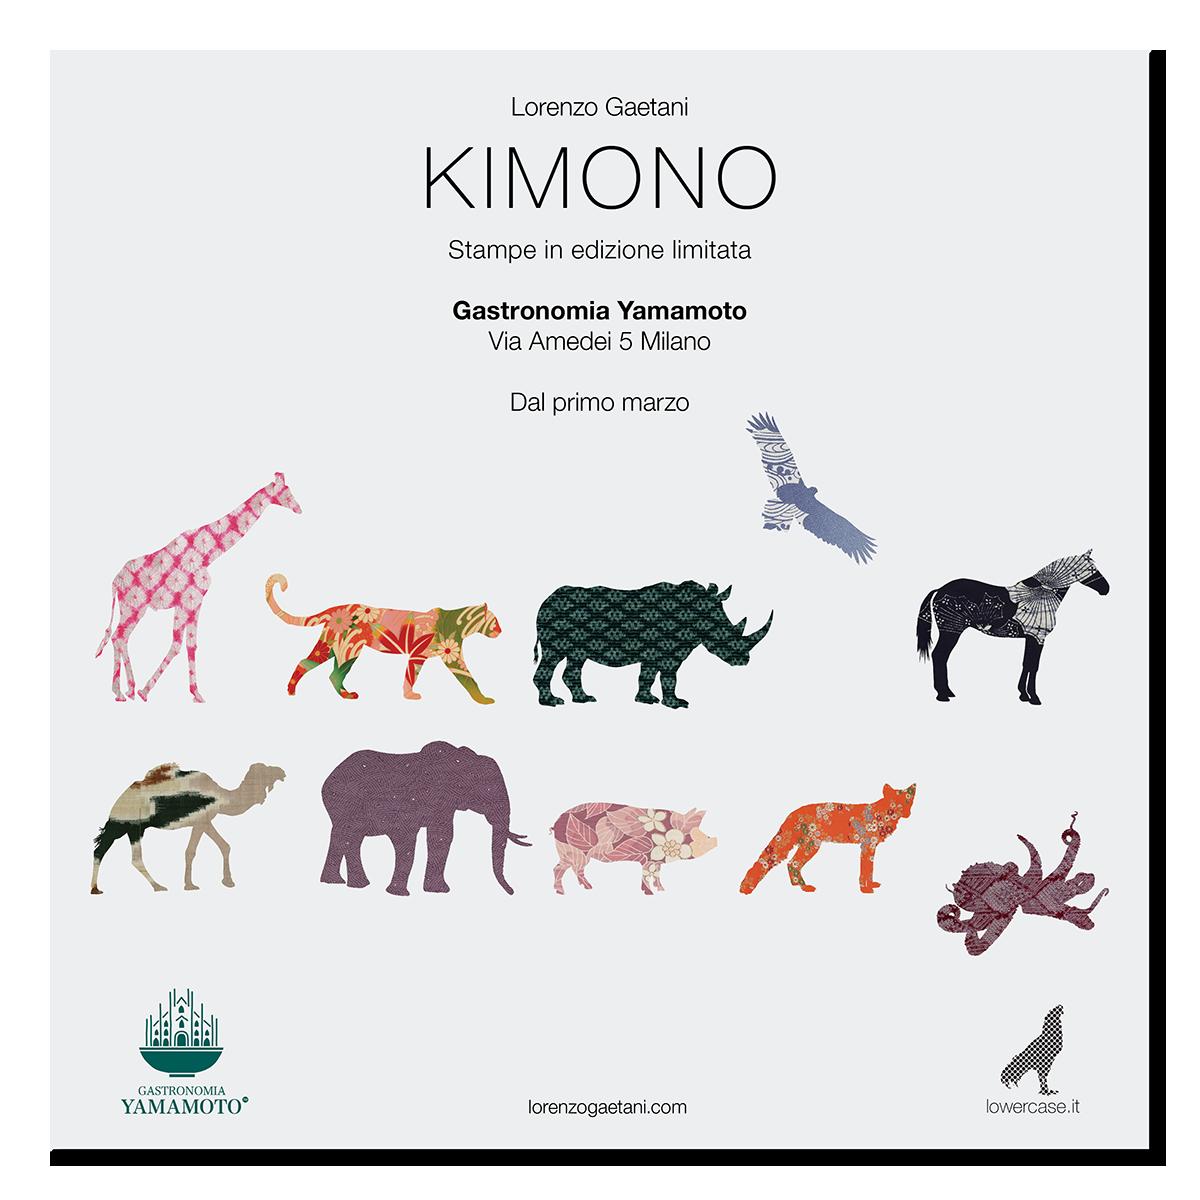 LORENZO GAETANI DESIGN KIMONO Stampe Gastronomia Yamamoto Milano